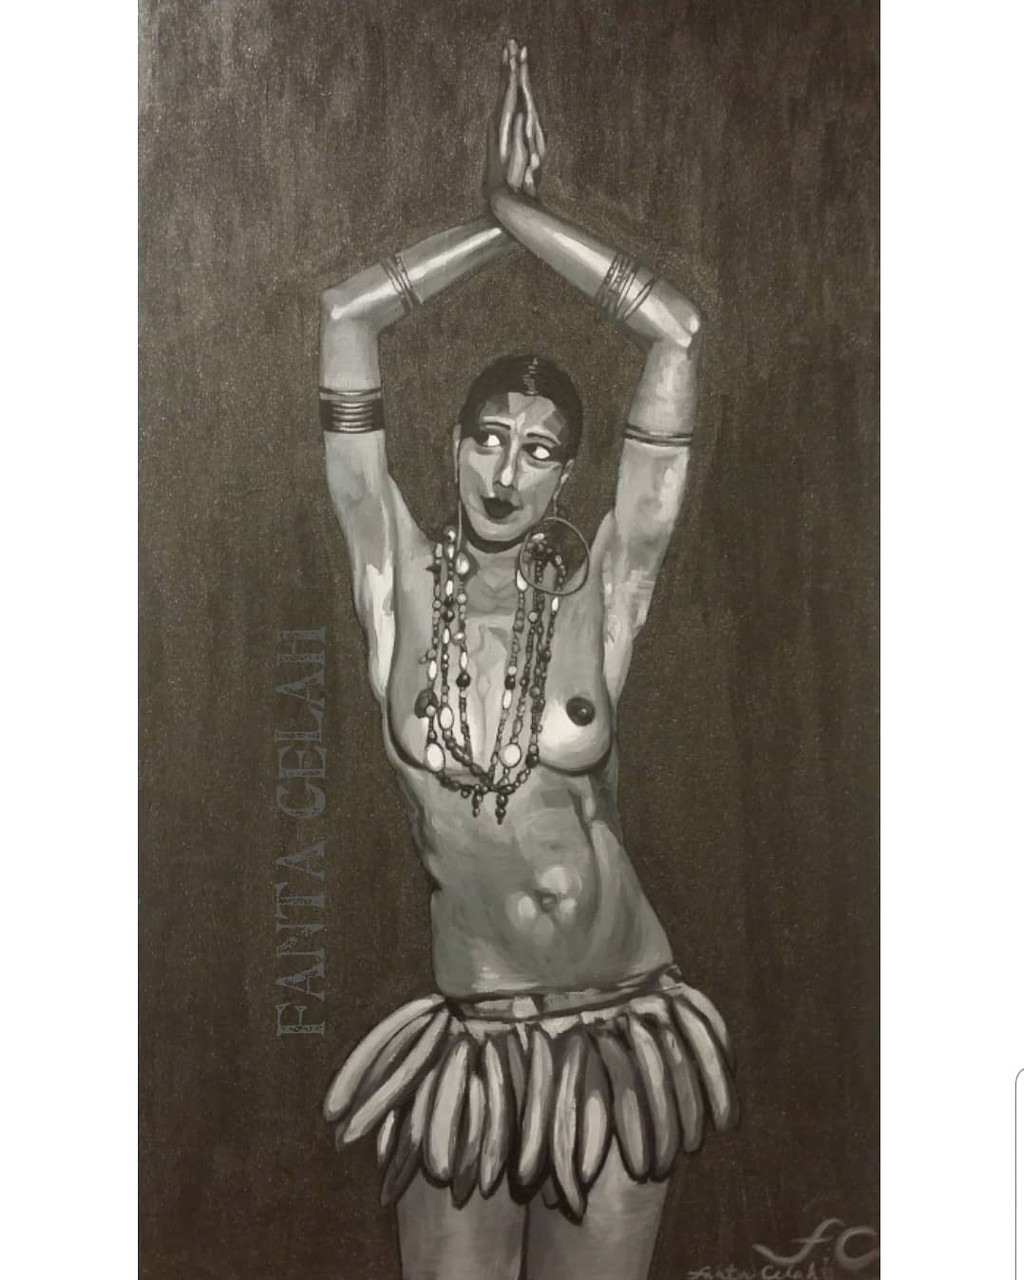 Josephine Baker: The Creole Goddess